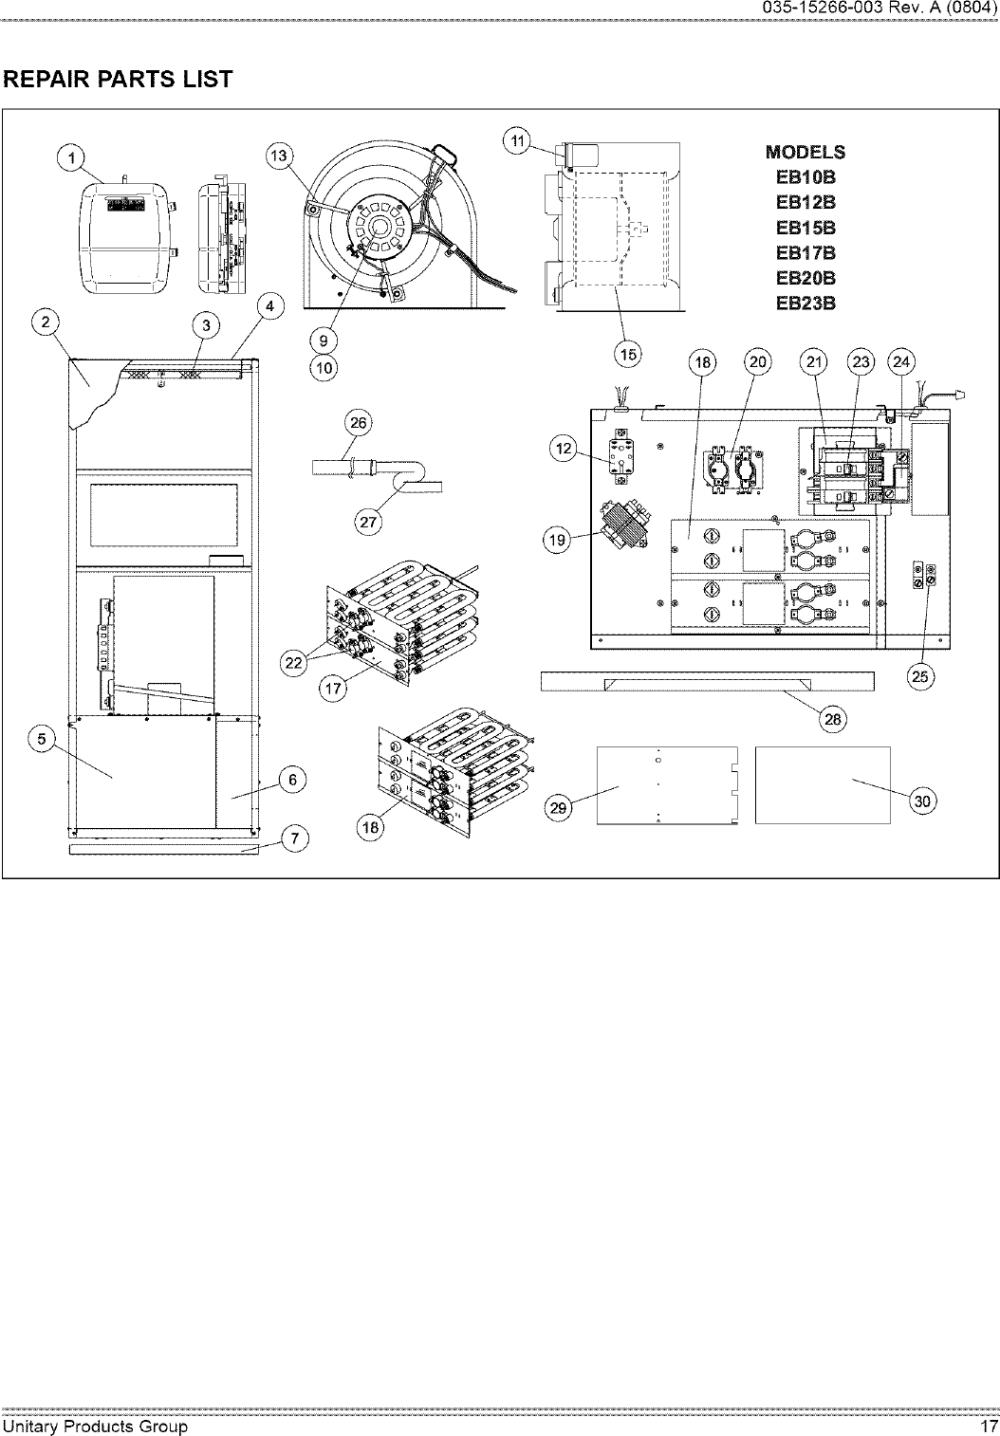 medium resolution of coleman eb12b installation manual manualslib makes it easy to find manuals online